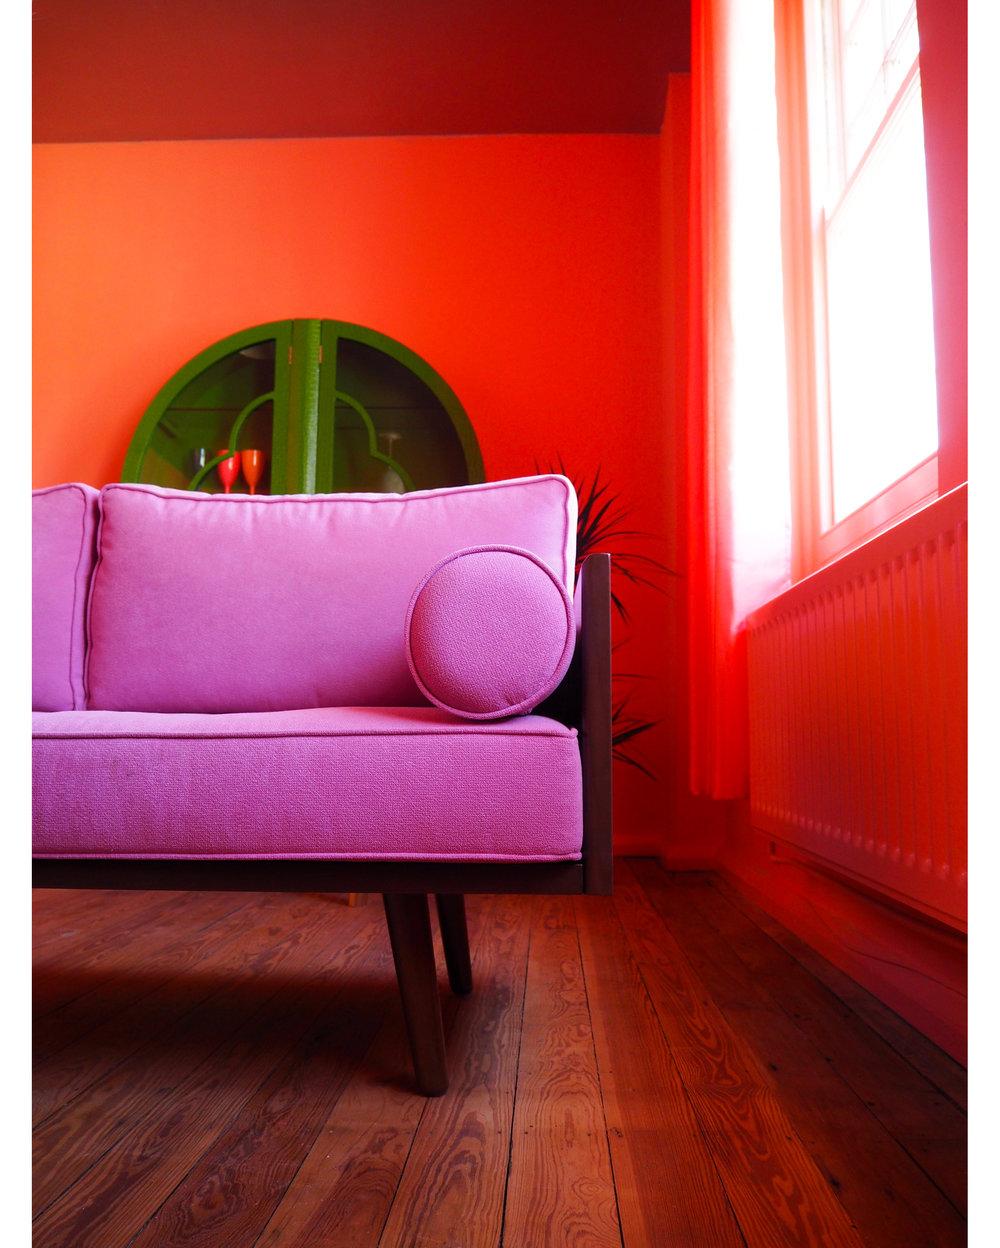 Living Room, Pink Sofa 2 w border.jpg